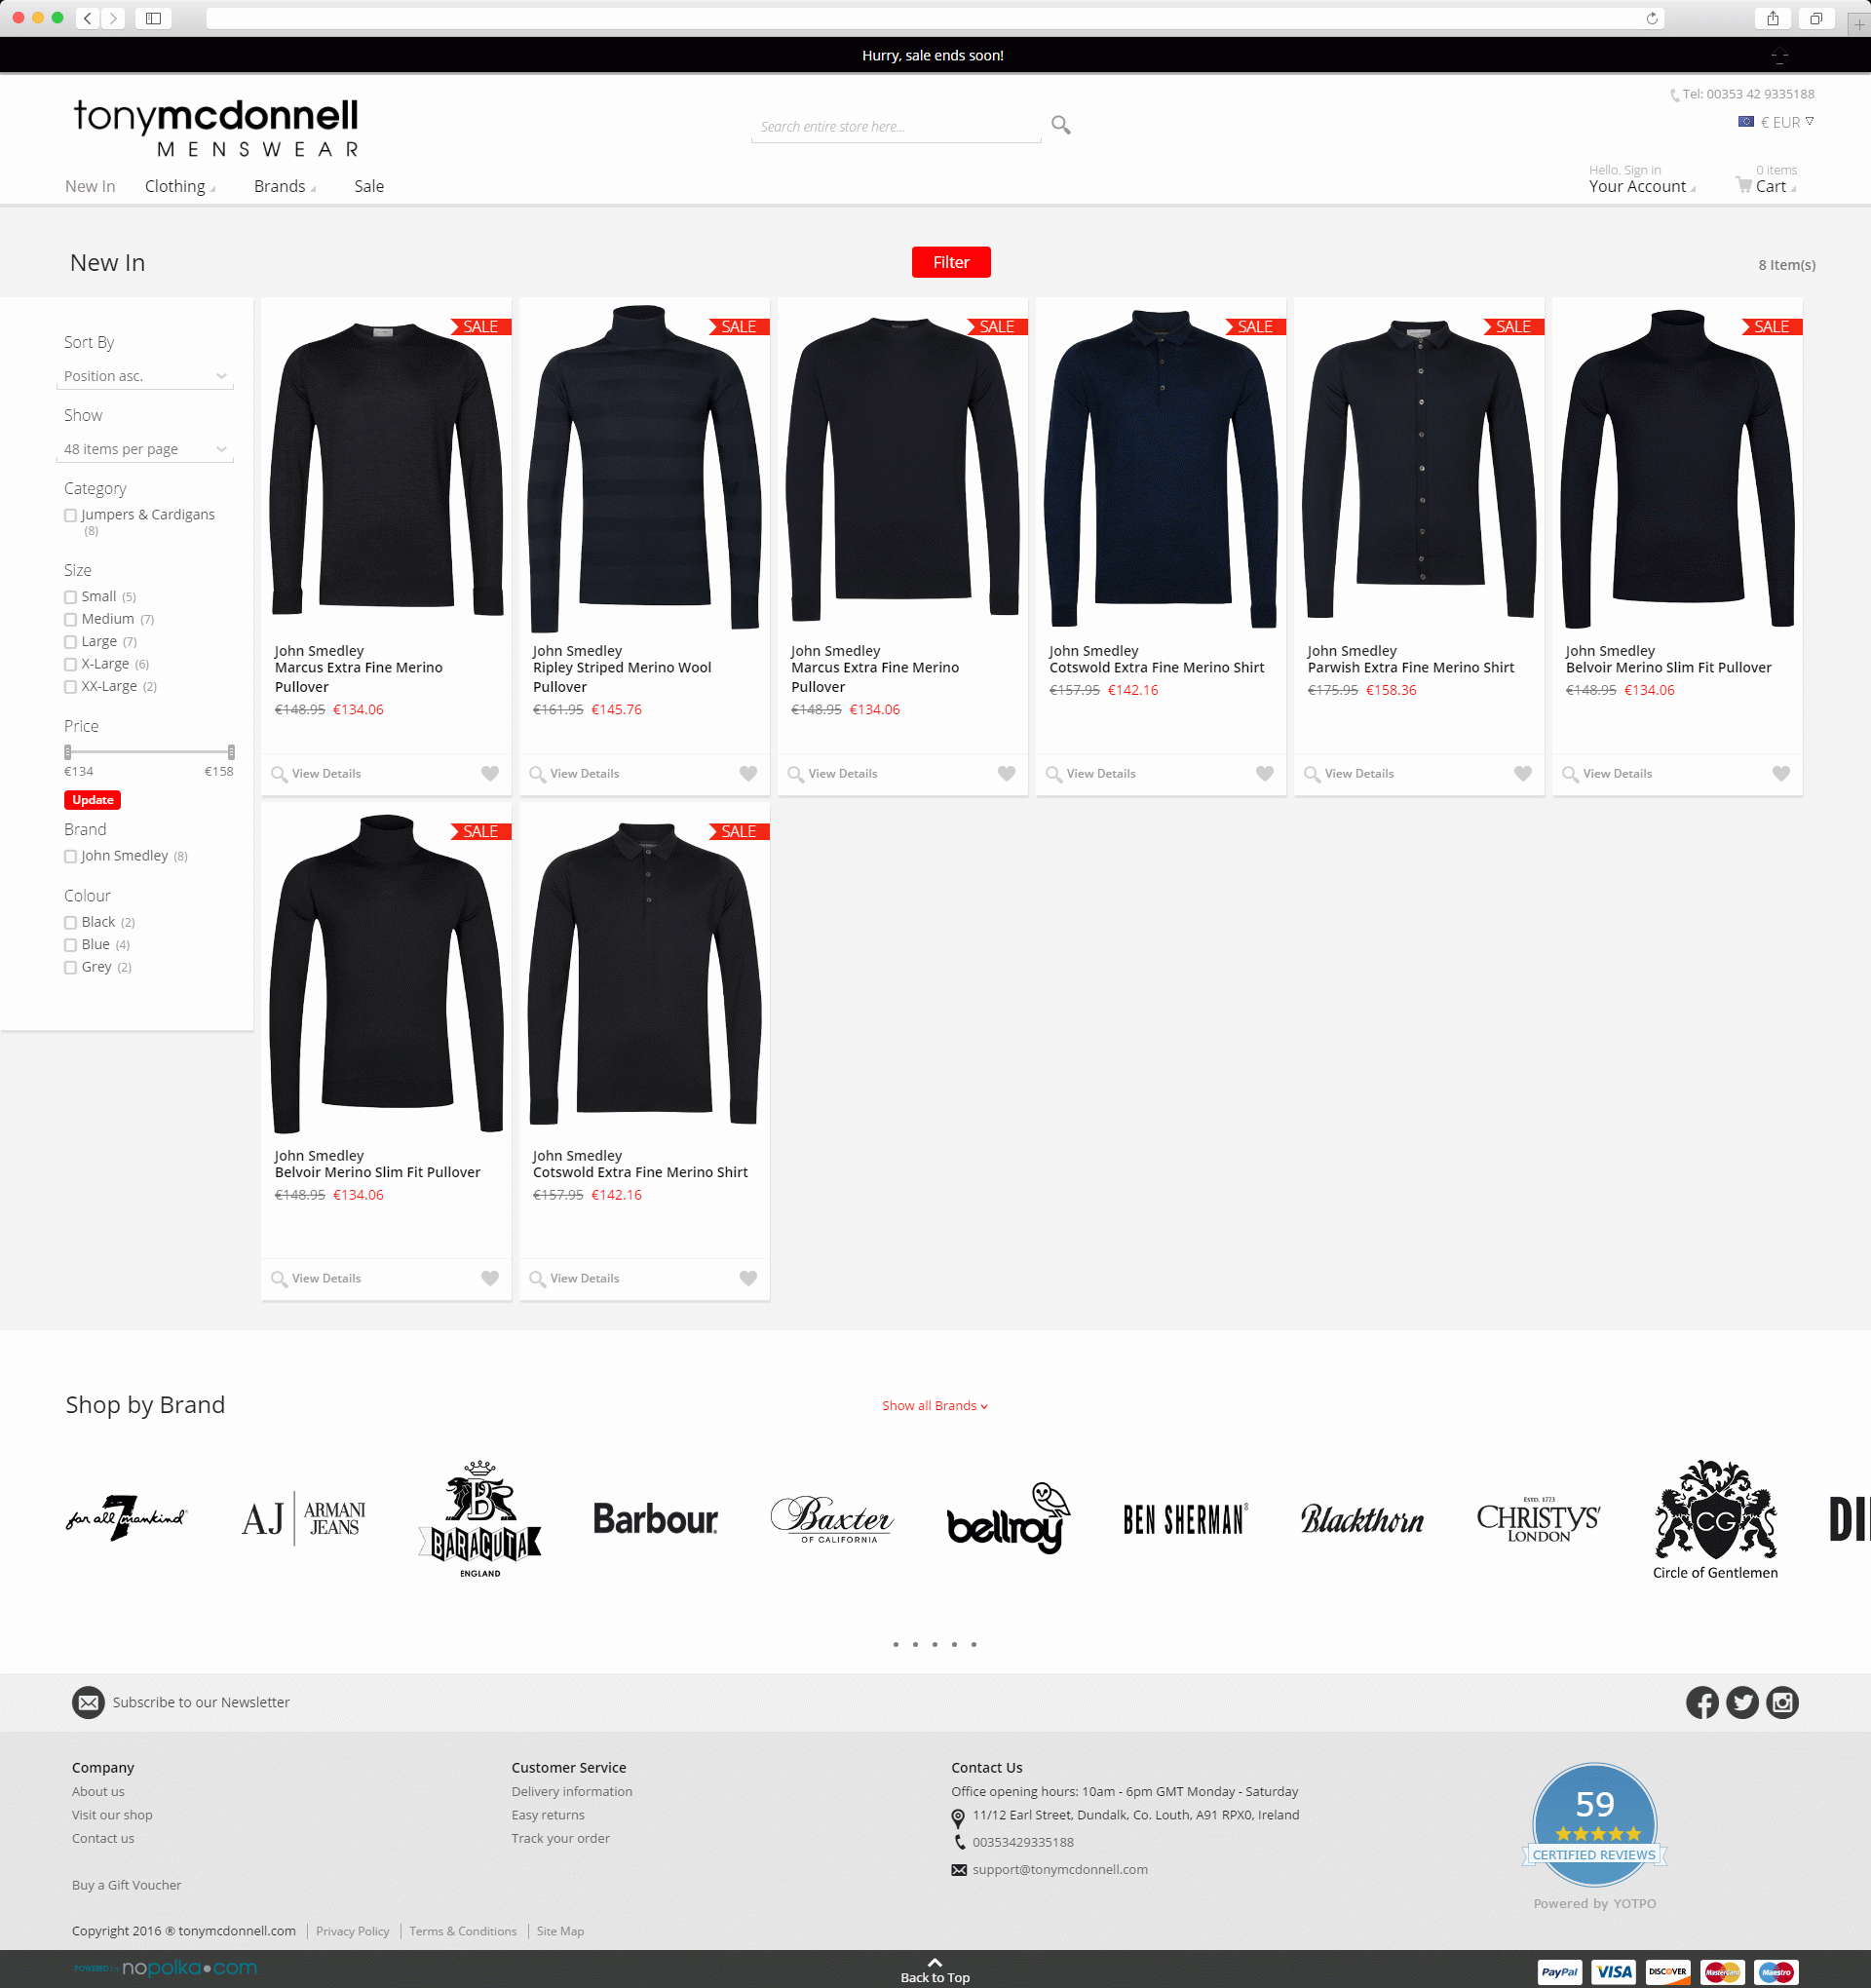 tonymcdonnell_catalog